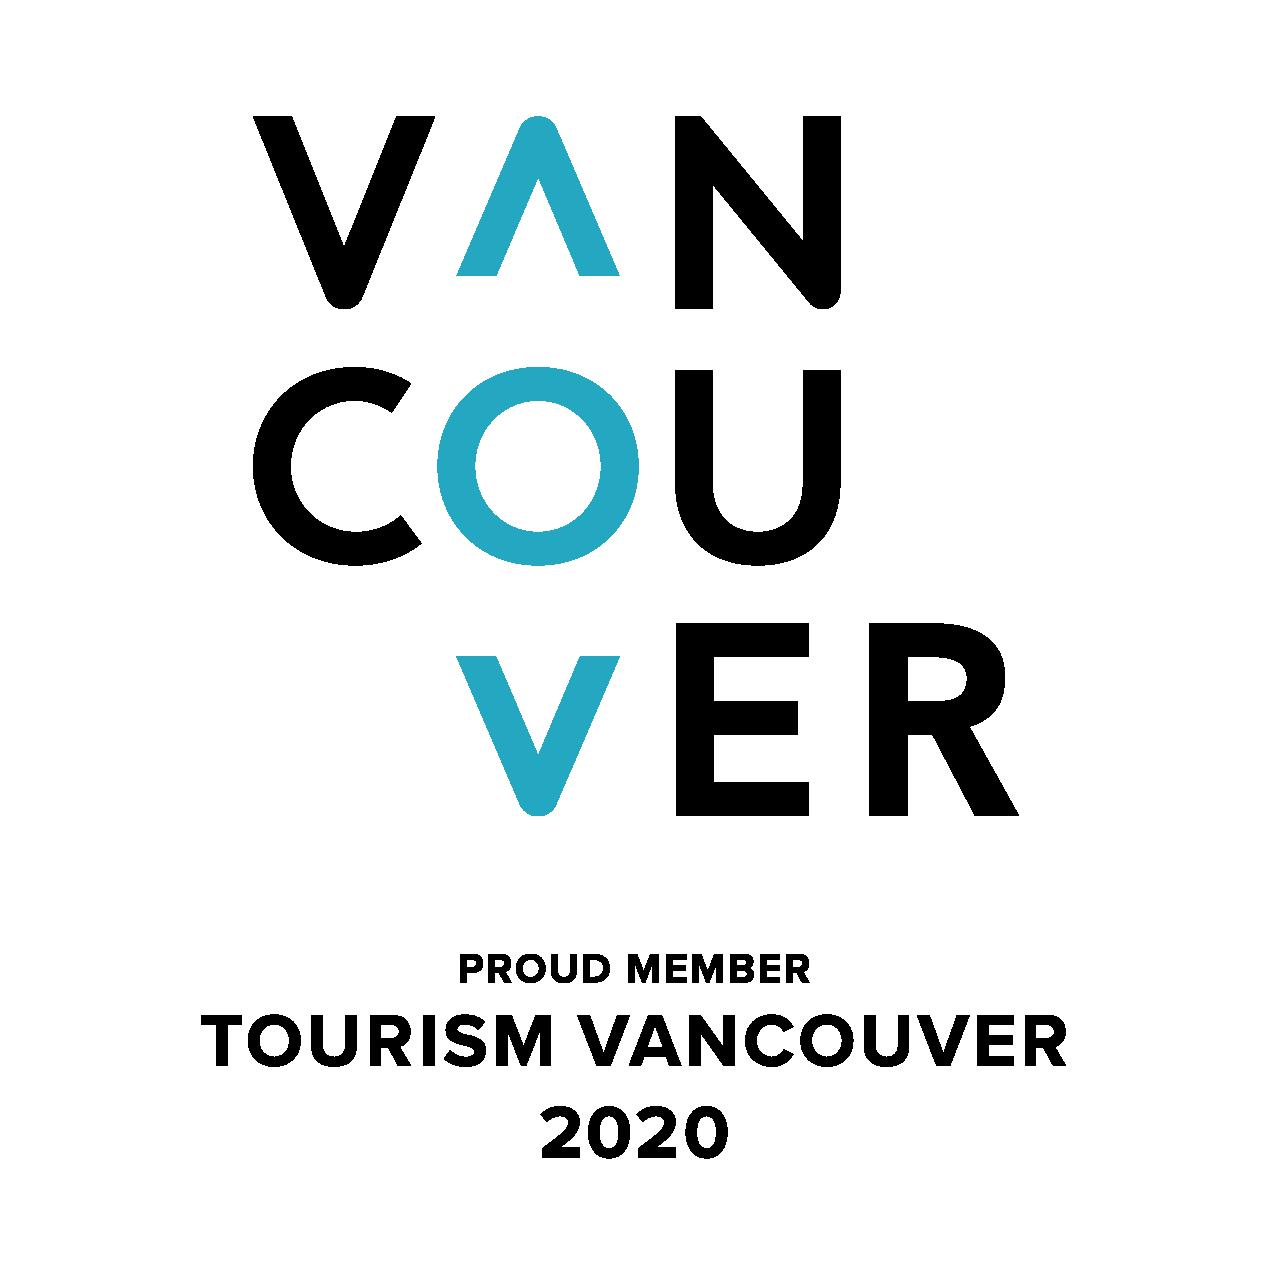 Tourism Vancouver Member